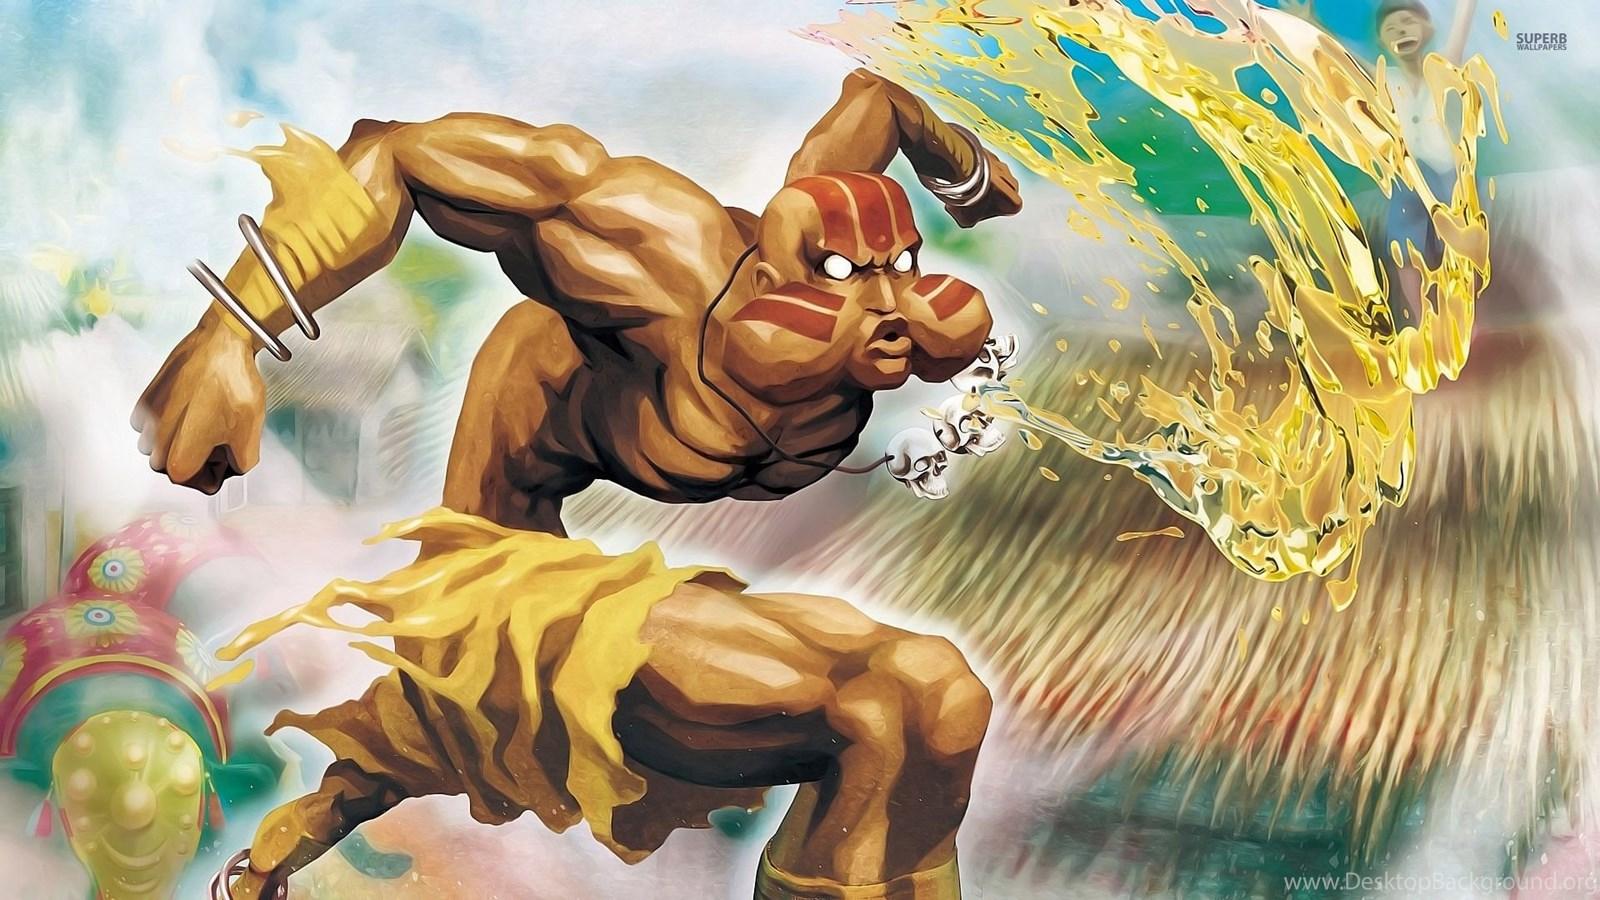 Dhalsim super street fighter ii the new challengers - Street fighter 2 wallpaper hd ...